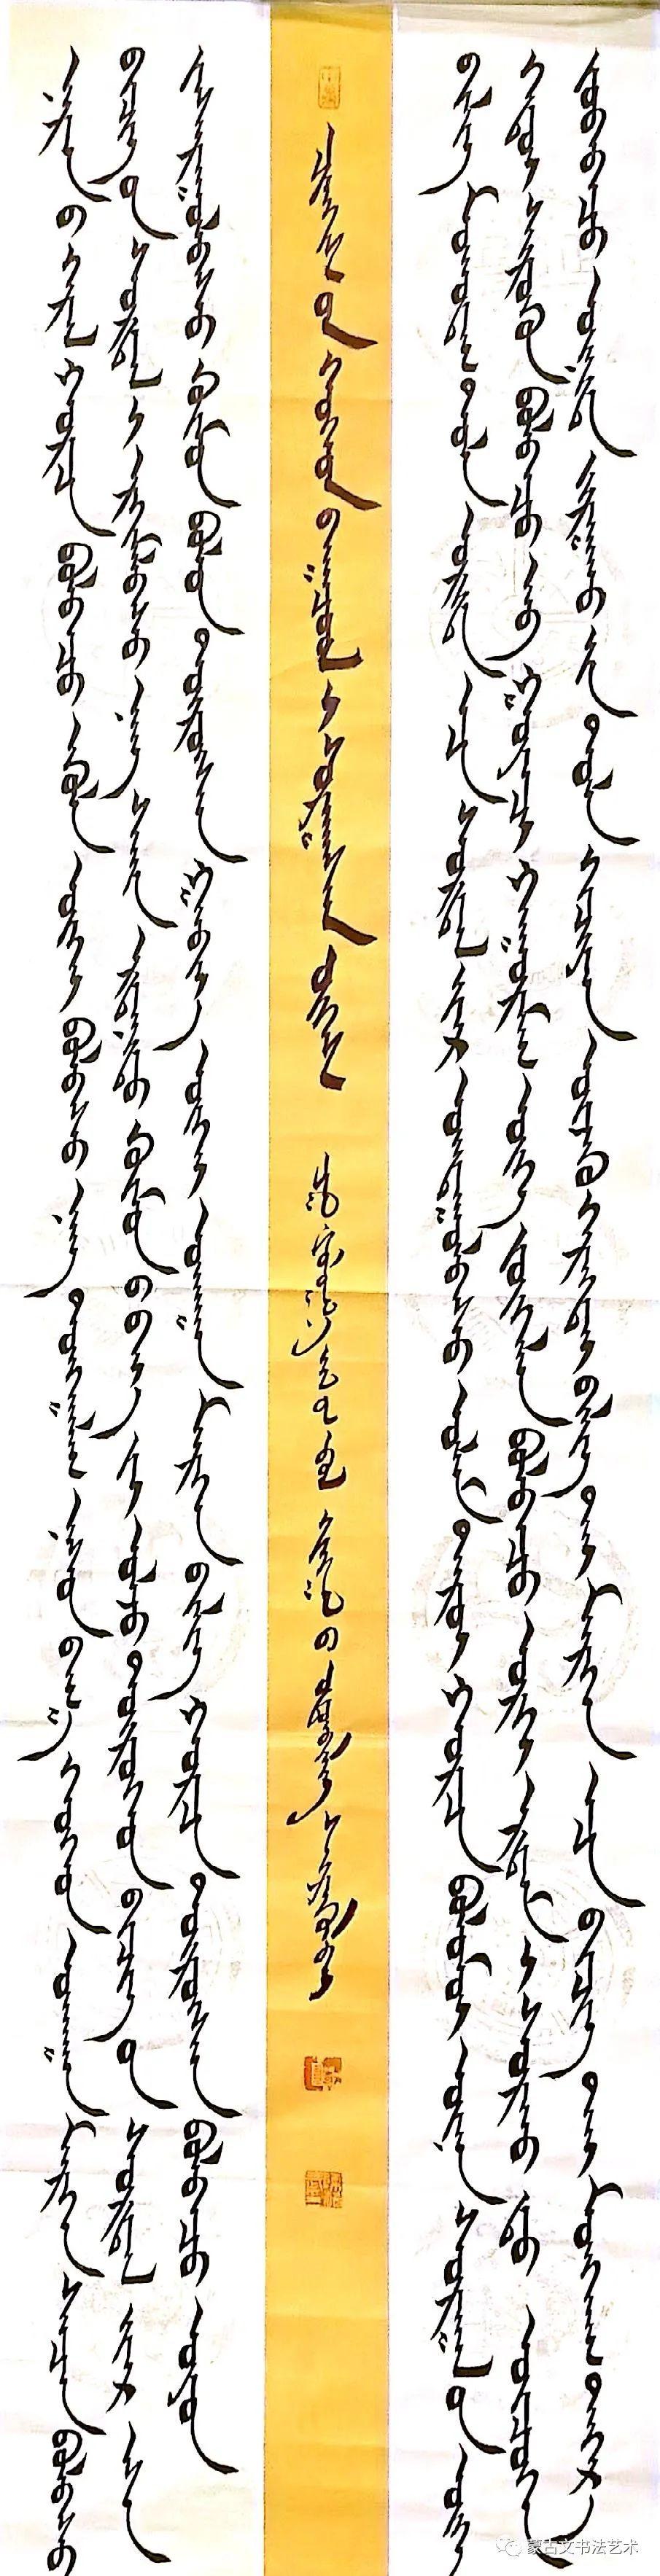 ᠪᠦᠲᠦᠭᠡᠯ  ᠰᠣᠨᠢᠷᠬᠠᠯ 第2张 ᠪᠦᠲᠦᠭᠡᠯ  ᠰᠣᠨᠢᠷᠬᠠᠯ 蒙古书法